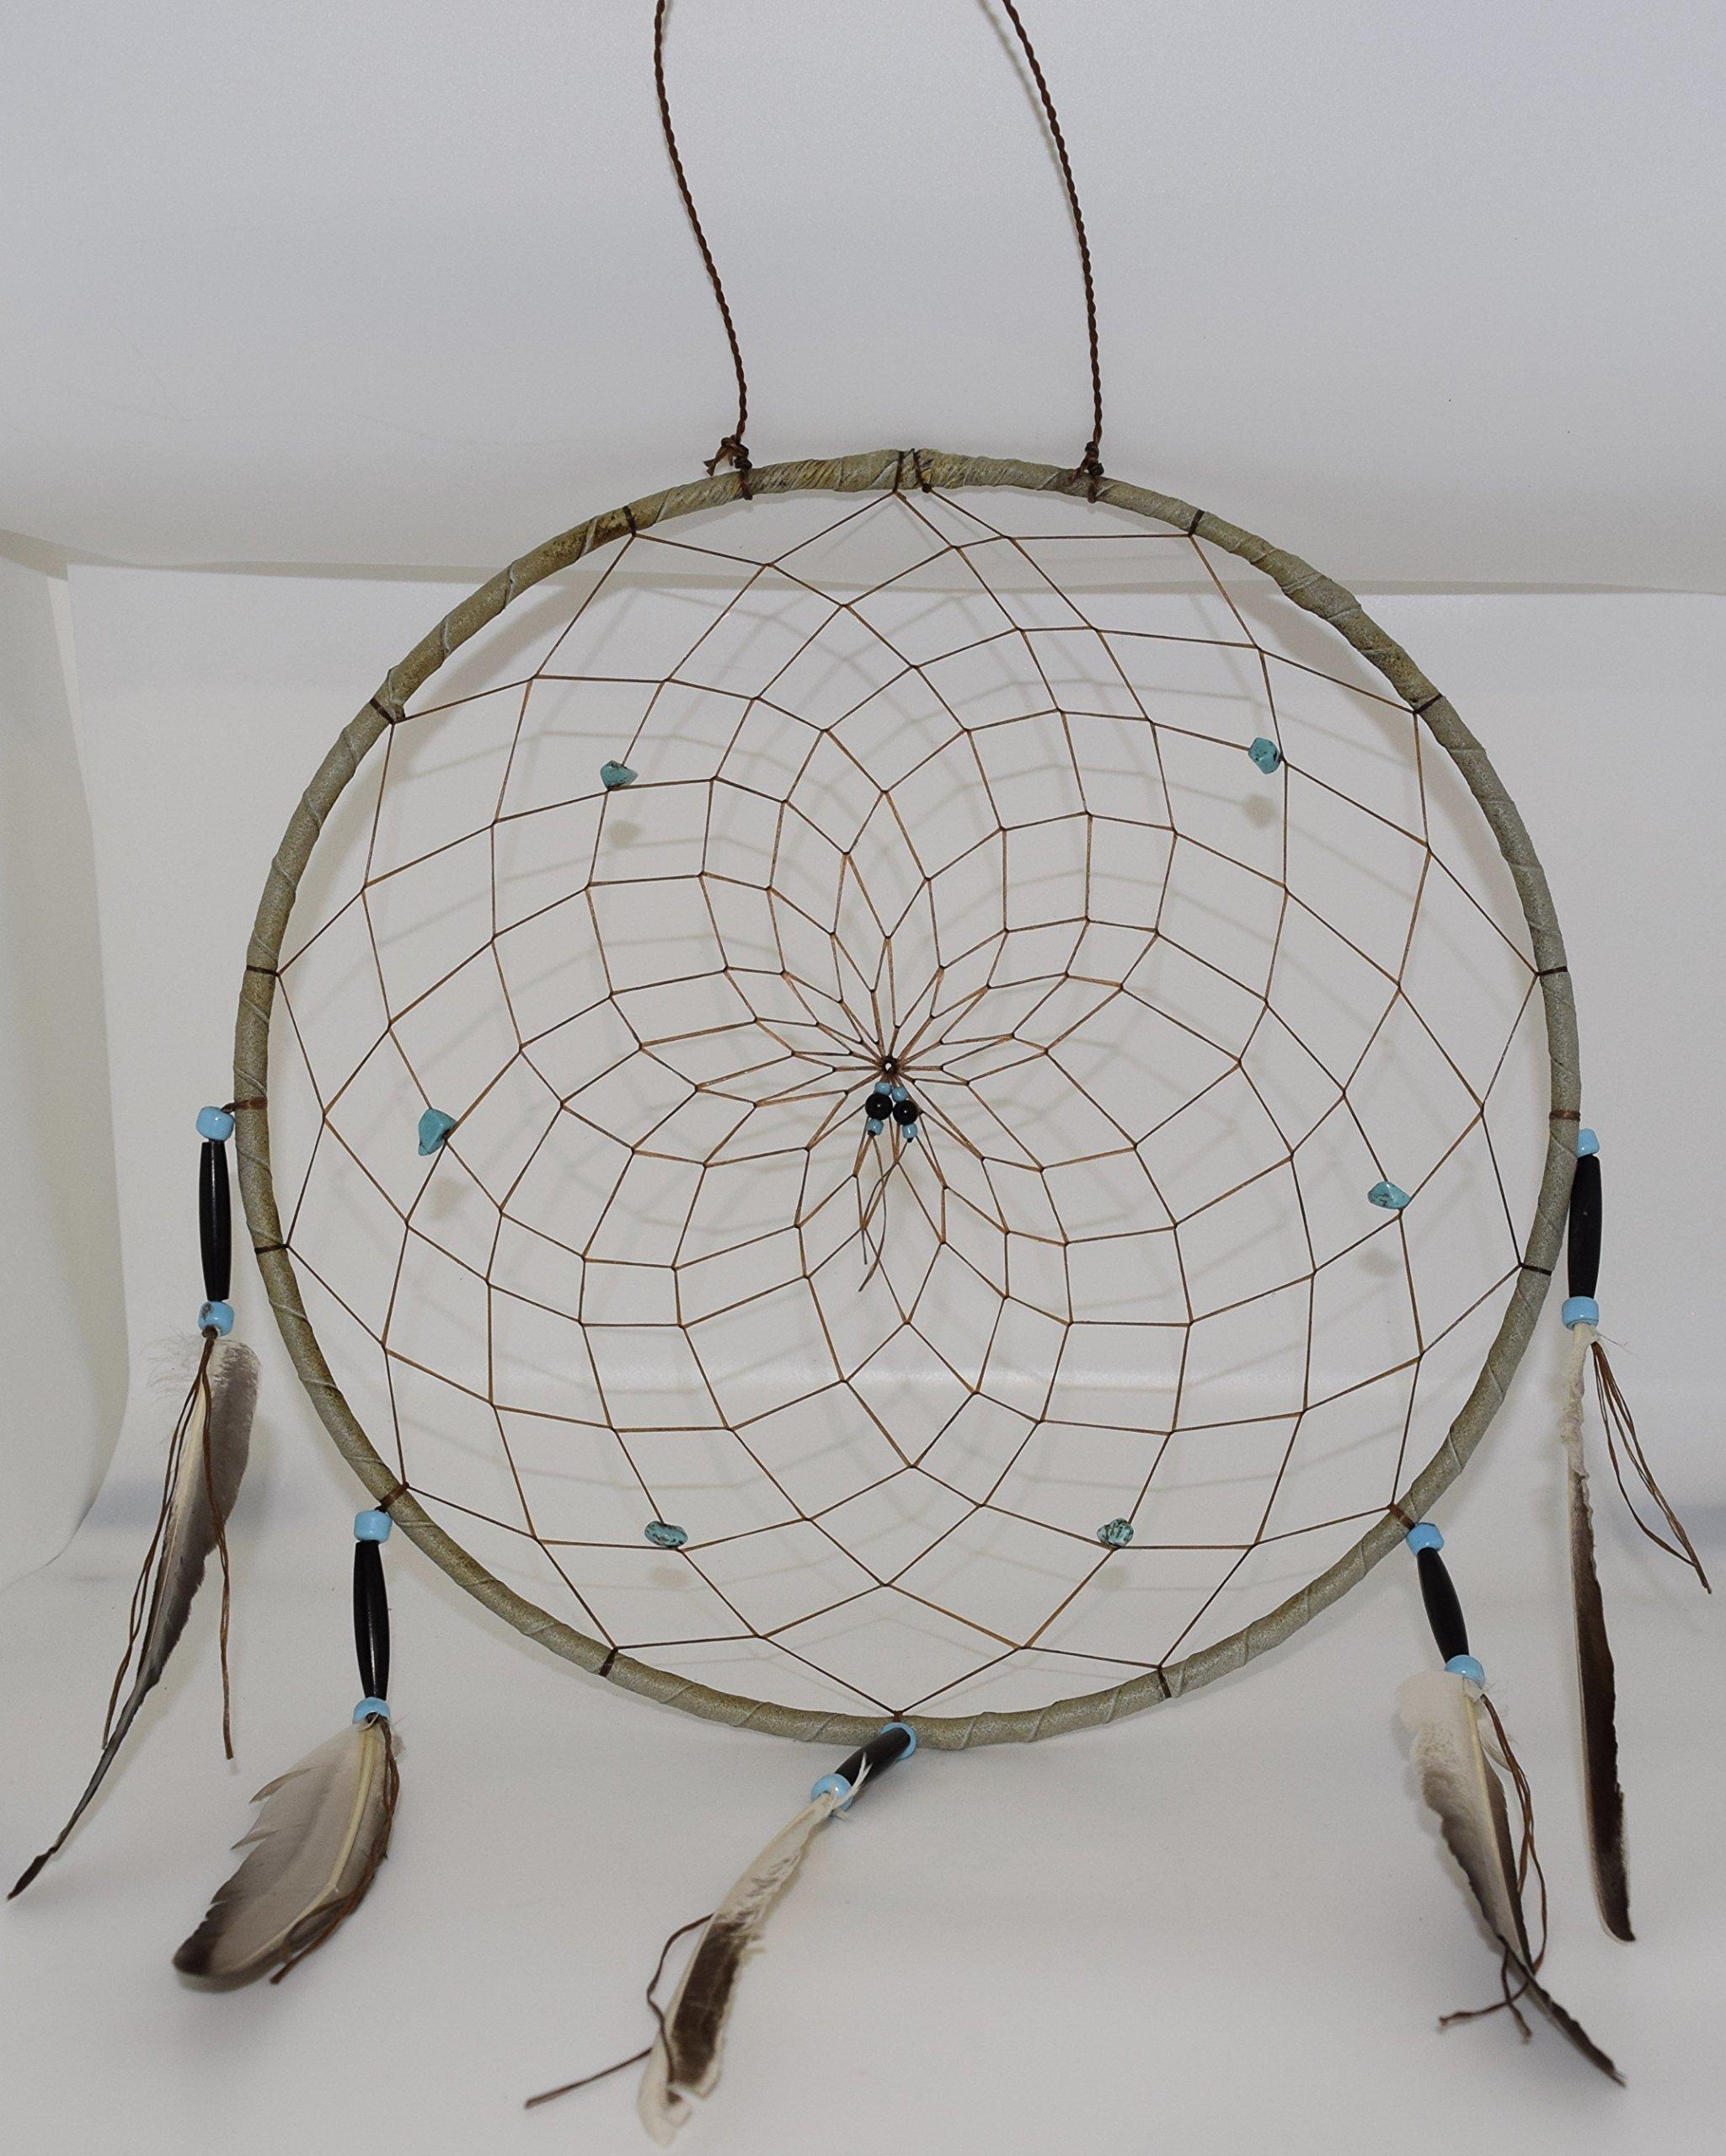 Genuine Handmade Dreamcatcher Wall Hanging